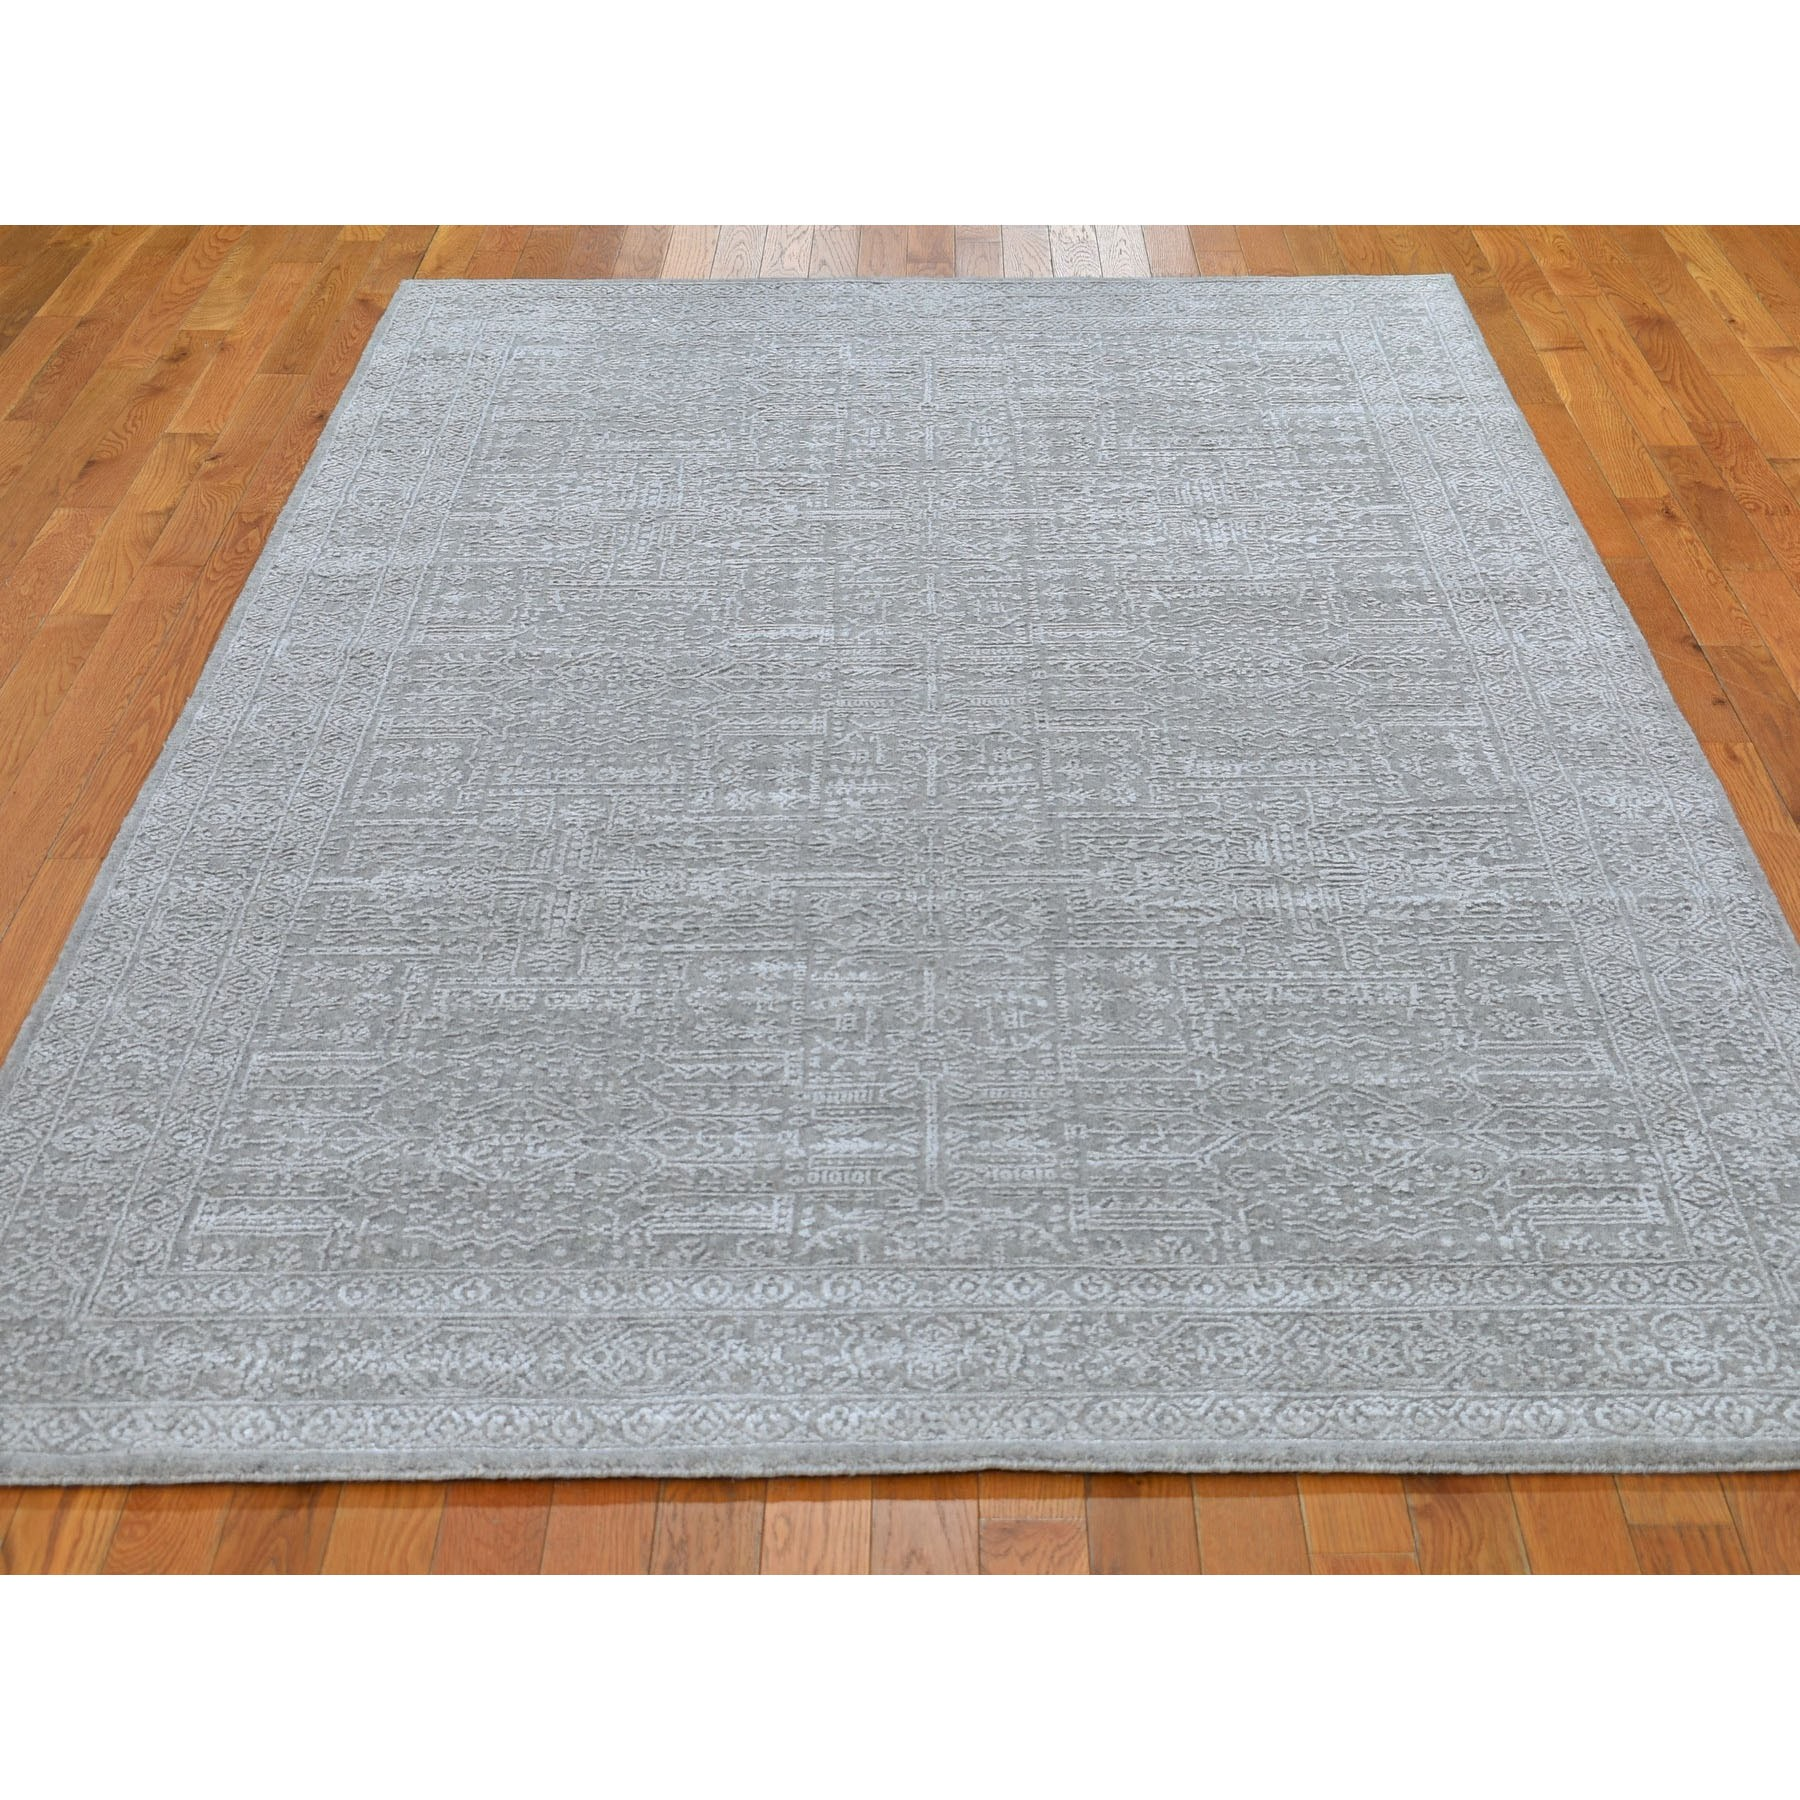 5-9 x9- Gray Fine jacquard Hand Loomed Modern Wool And Art Silk Oriental Rug